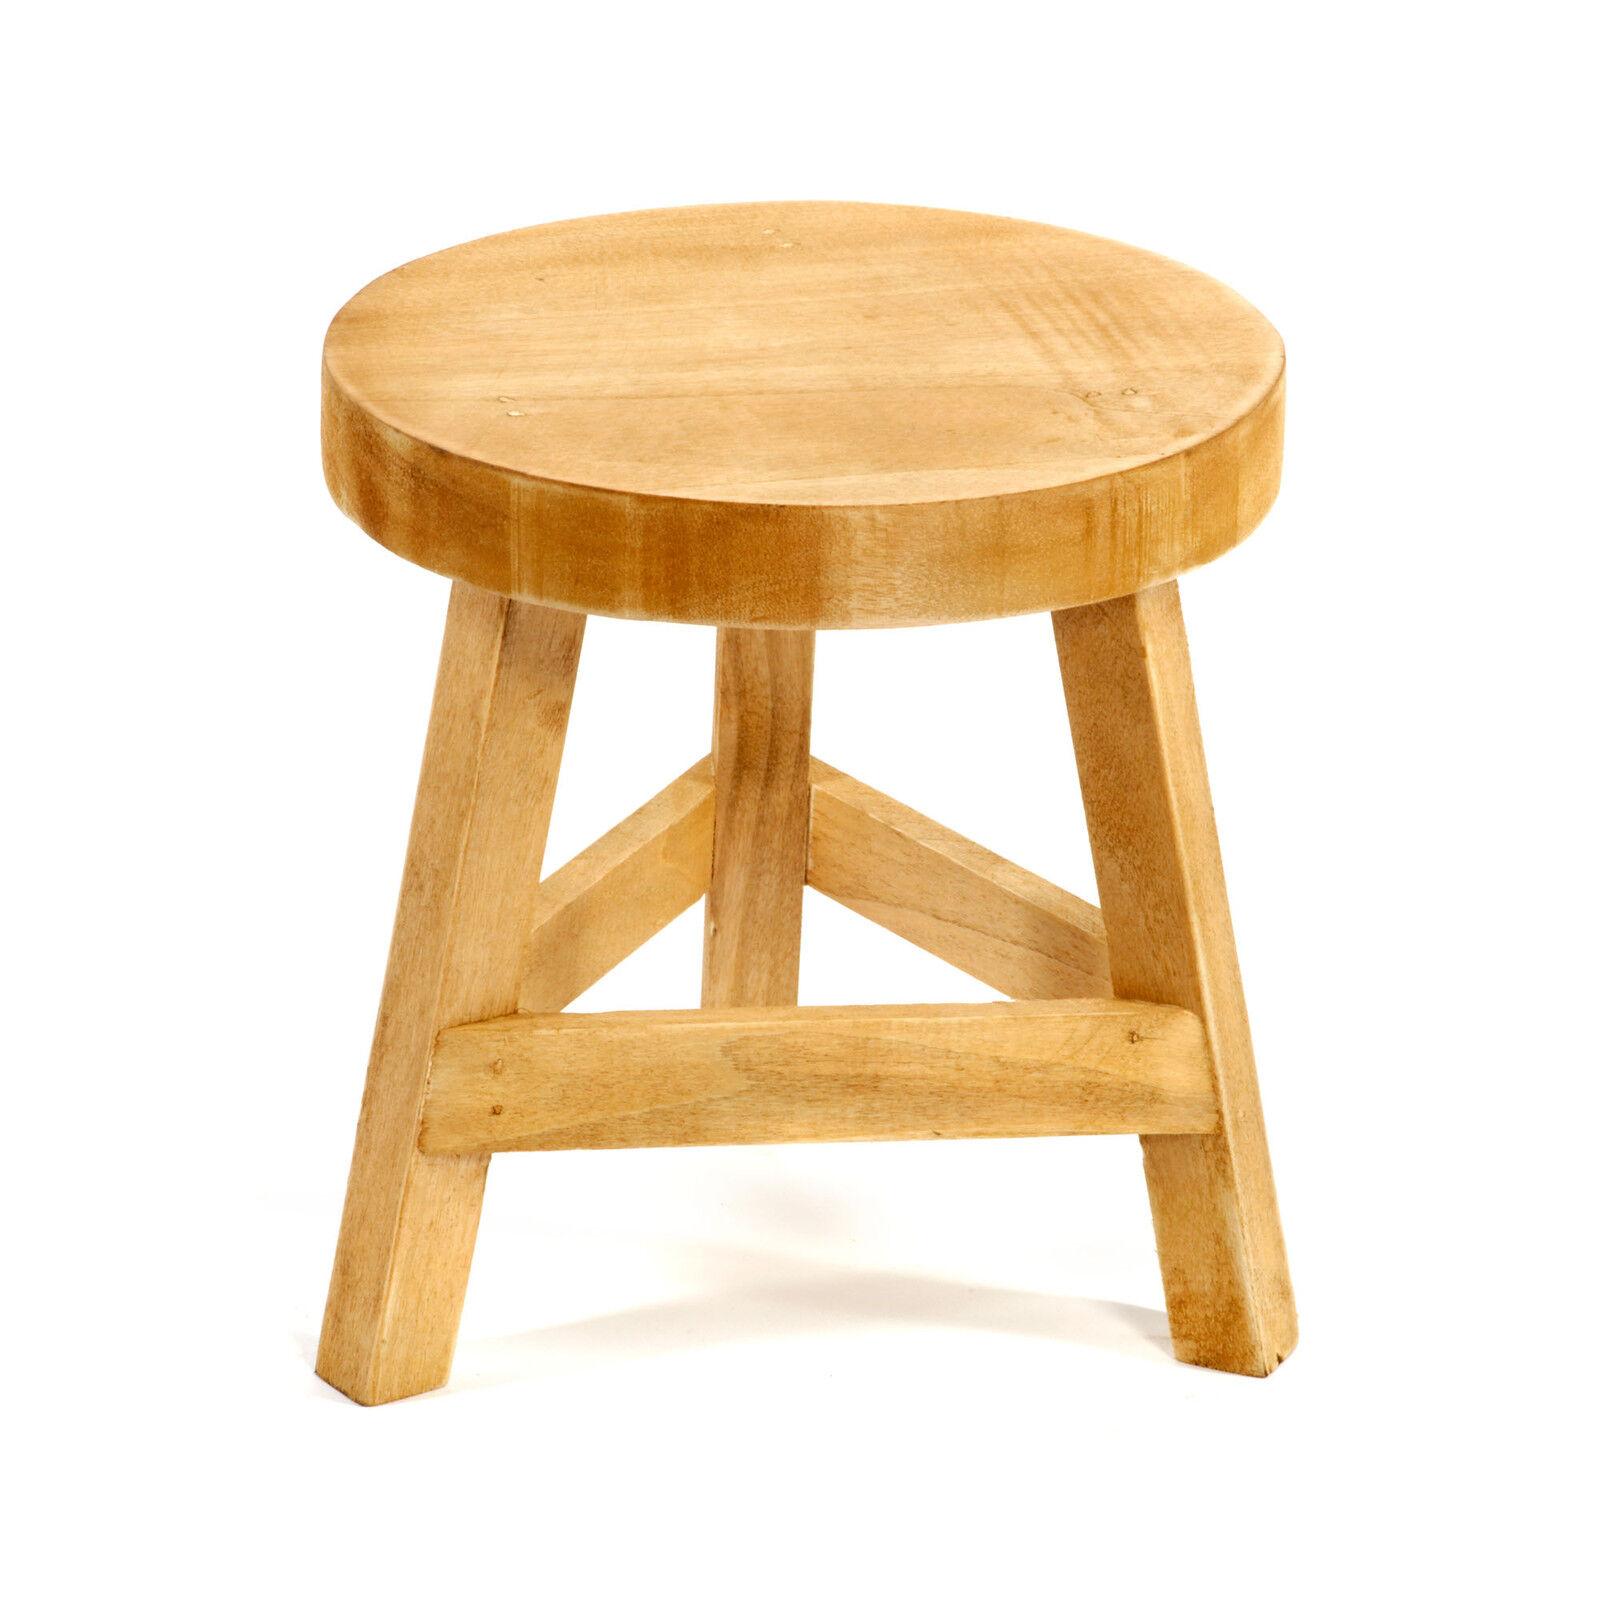 3 legged chair back design names shabby chic wooden three stool 23cm high home